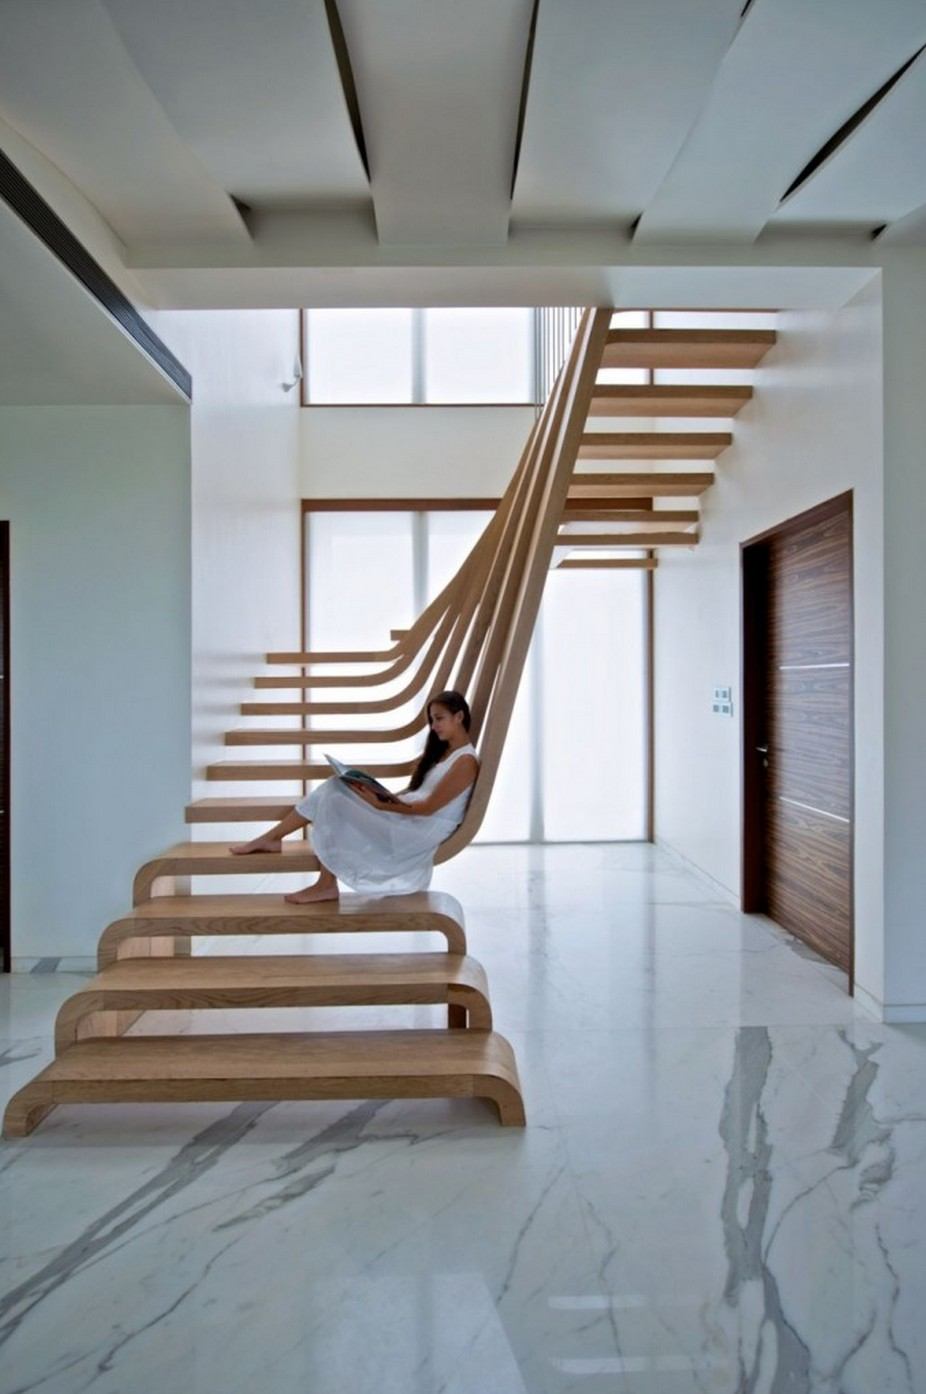 Trs bel escalier design  Mumbai  Blog Dco Design